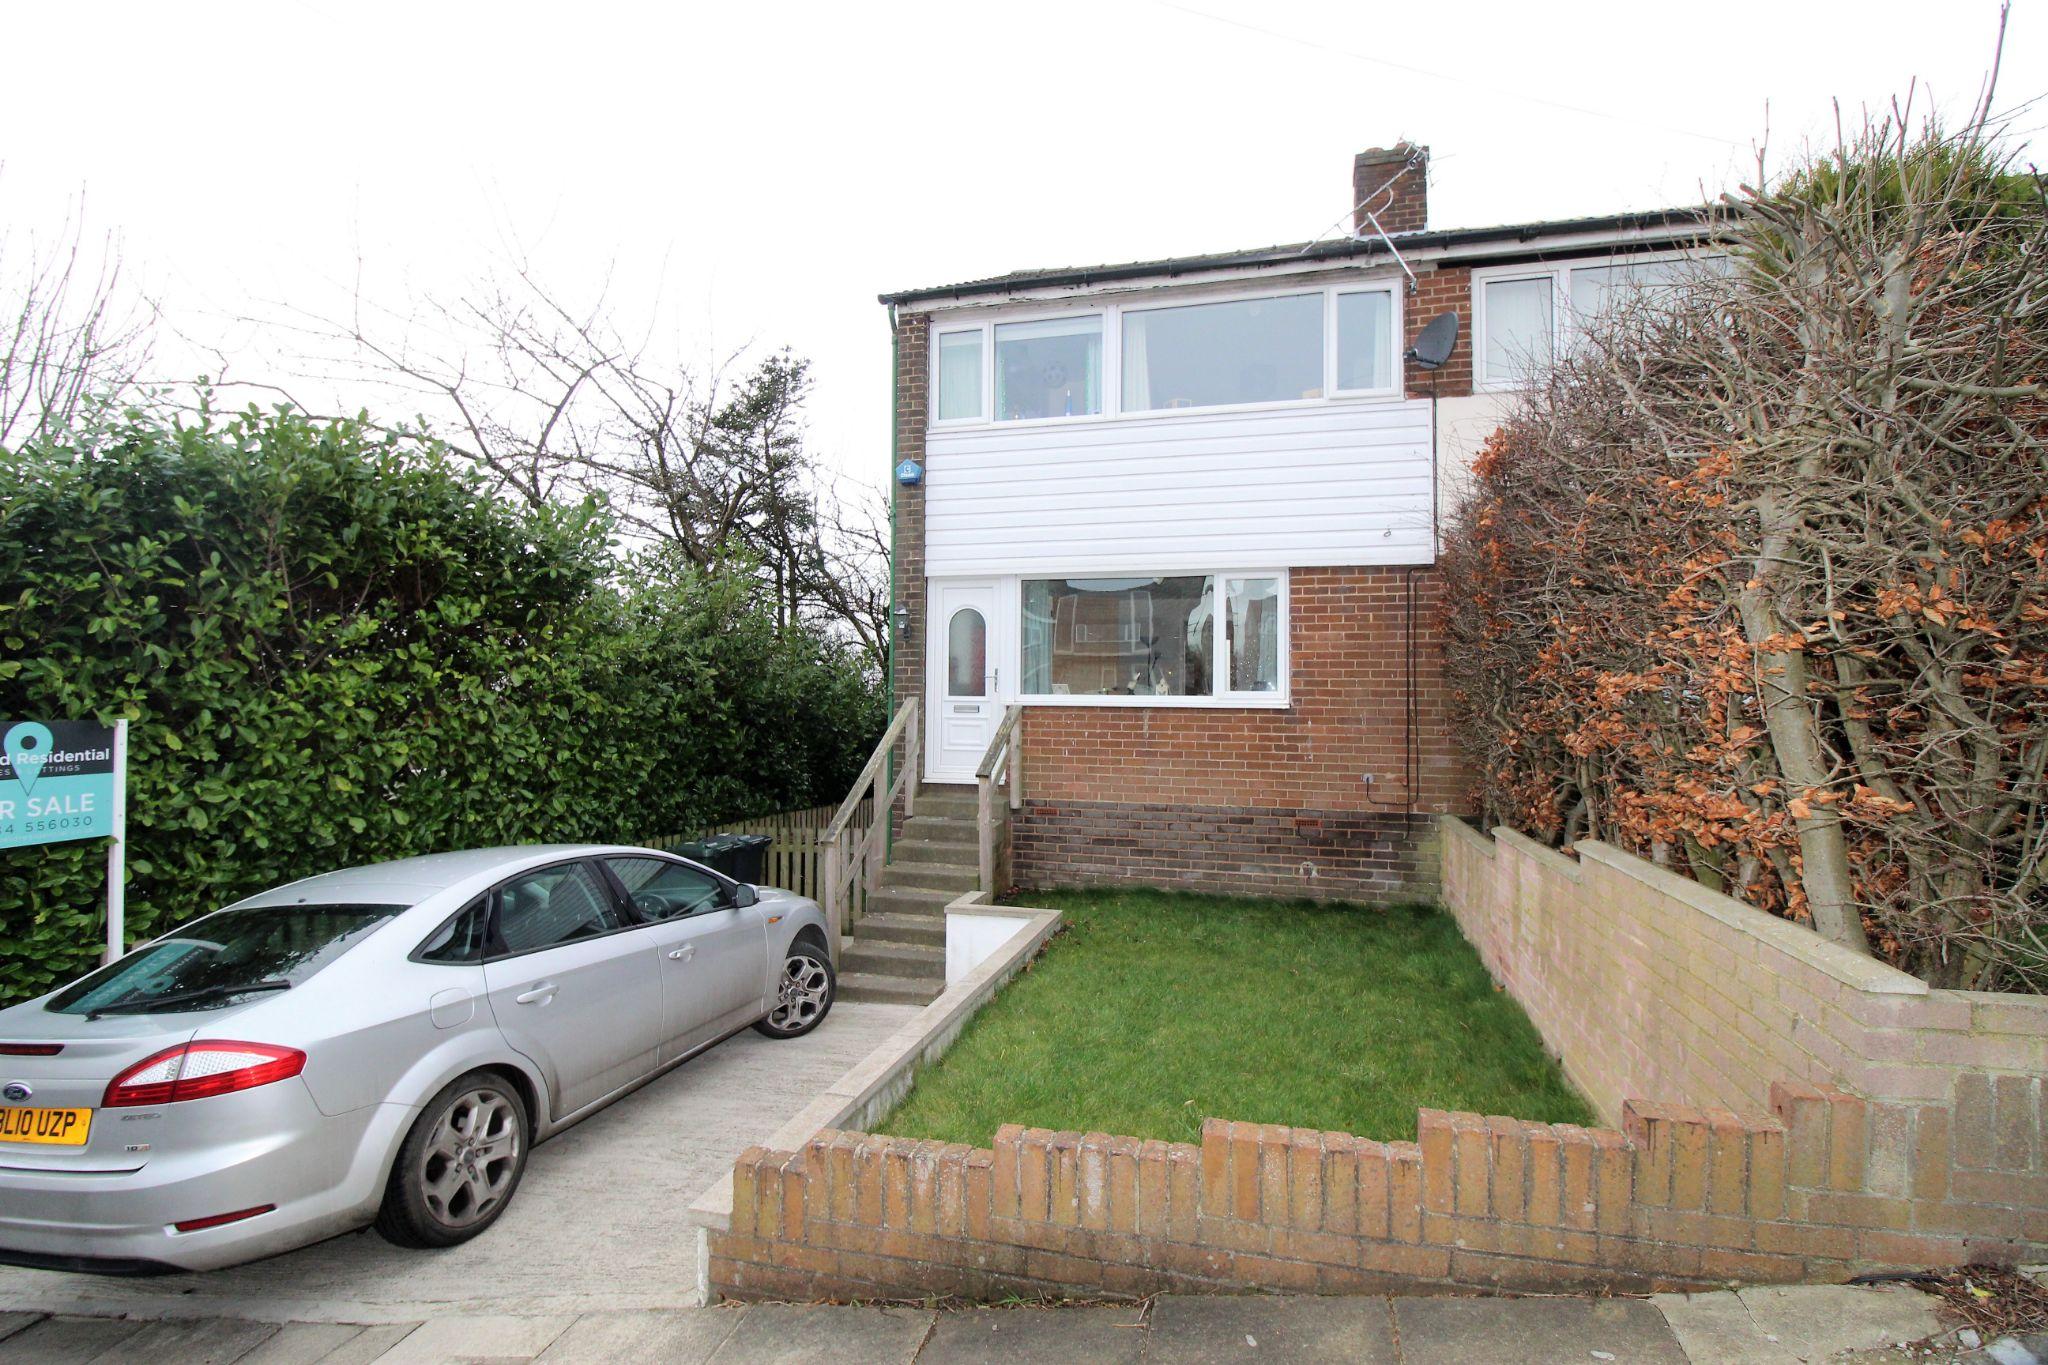 3 bedroom semi-detached house SSTC in Shipley - Front elevation